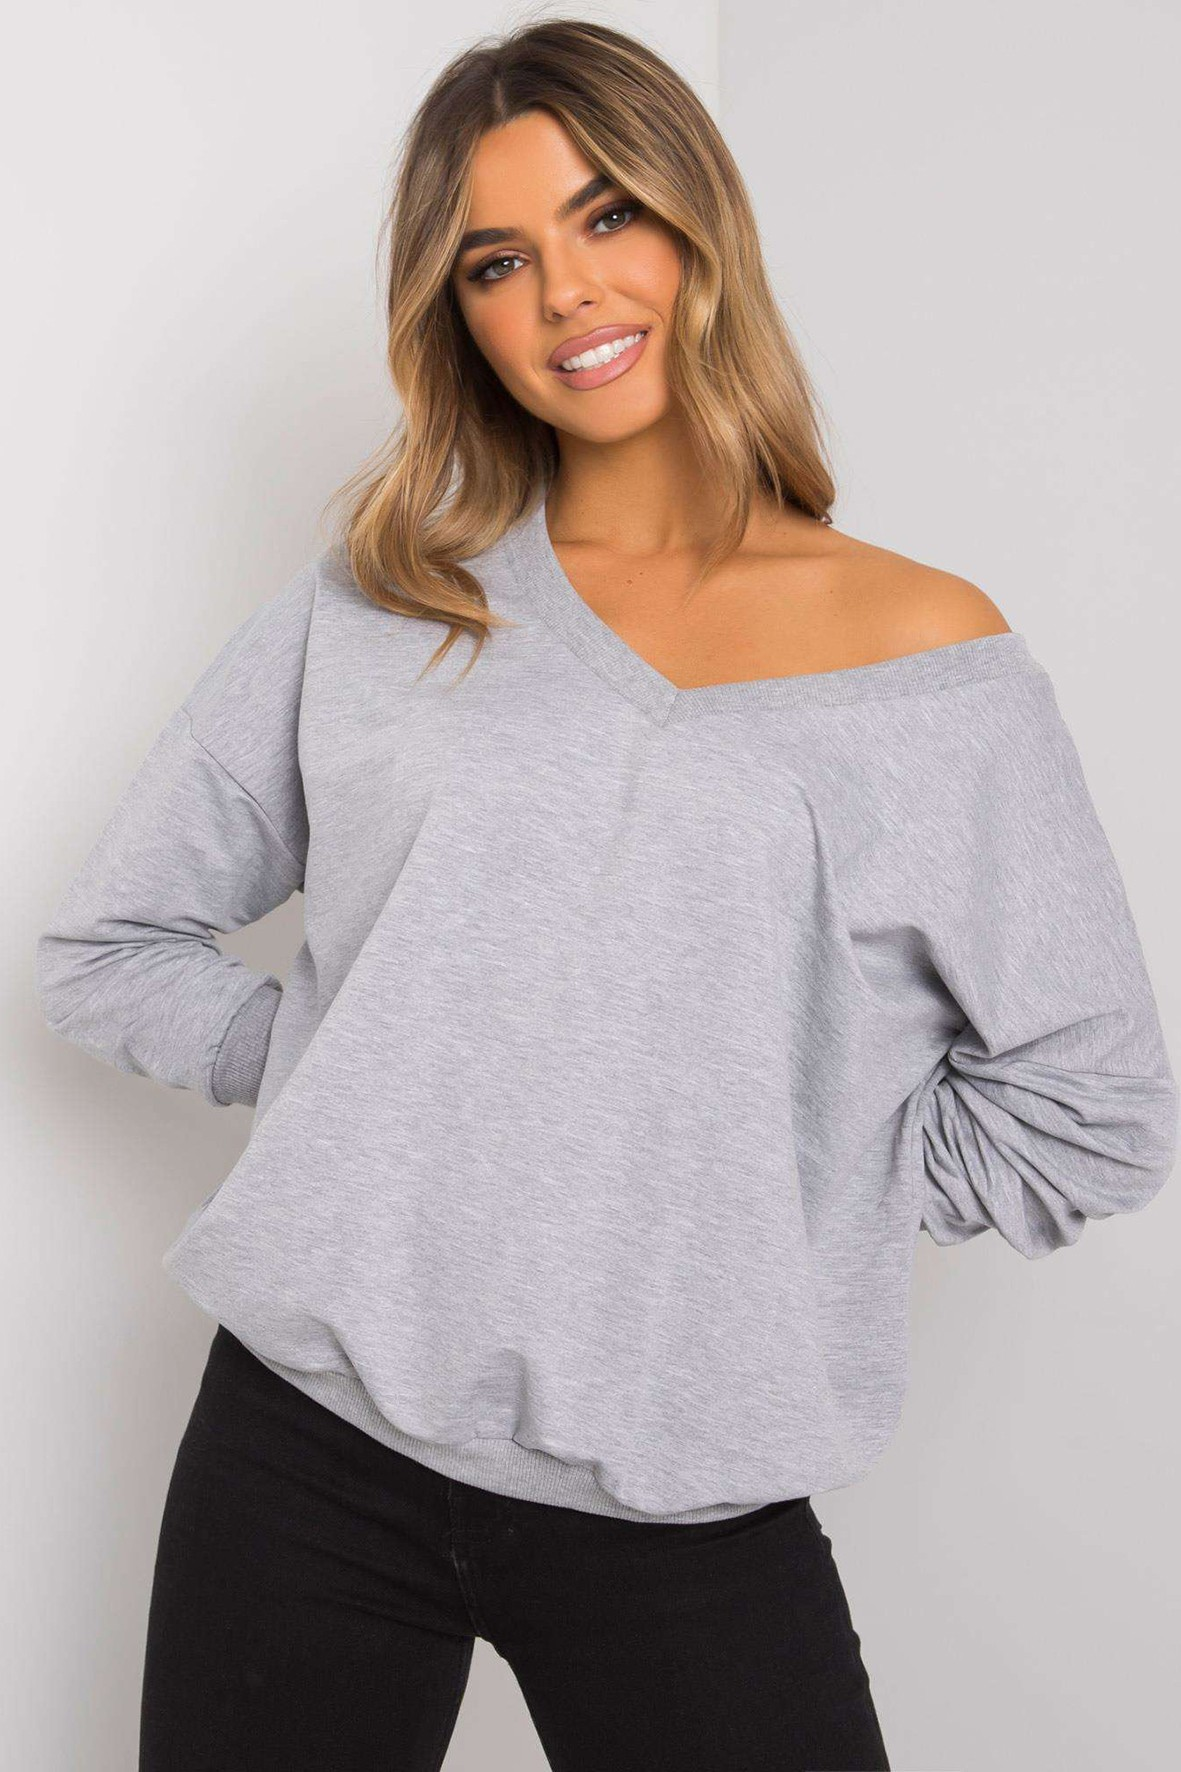 Szara melanżowa bluza bawełniana damska